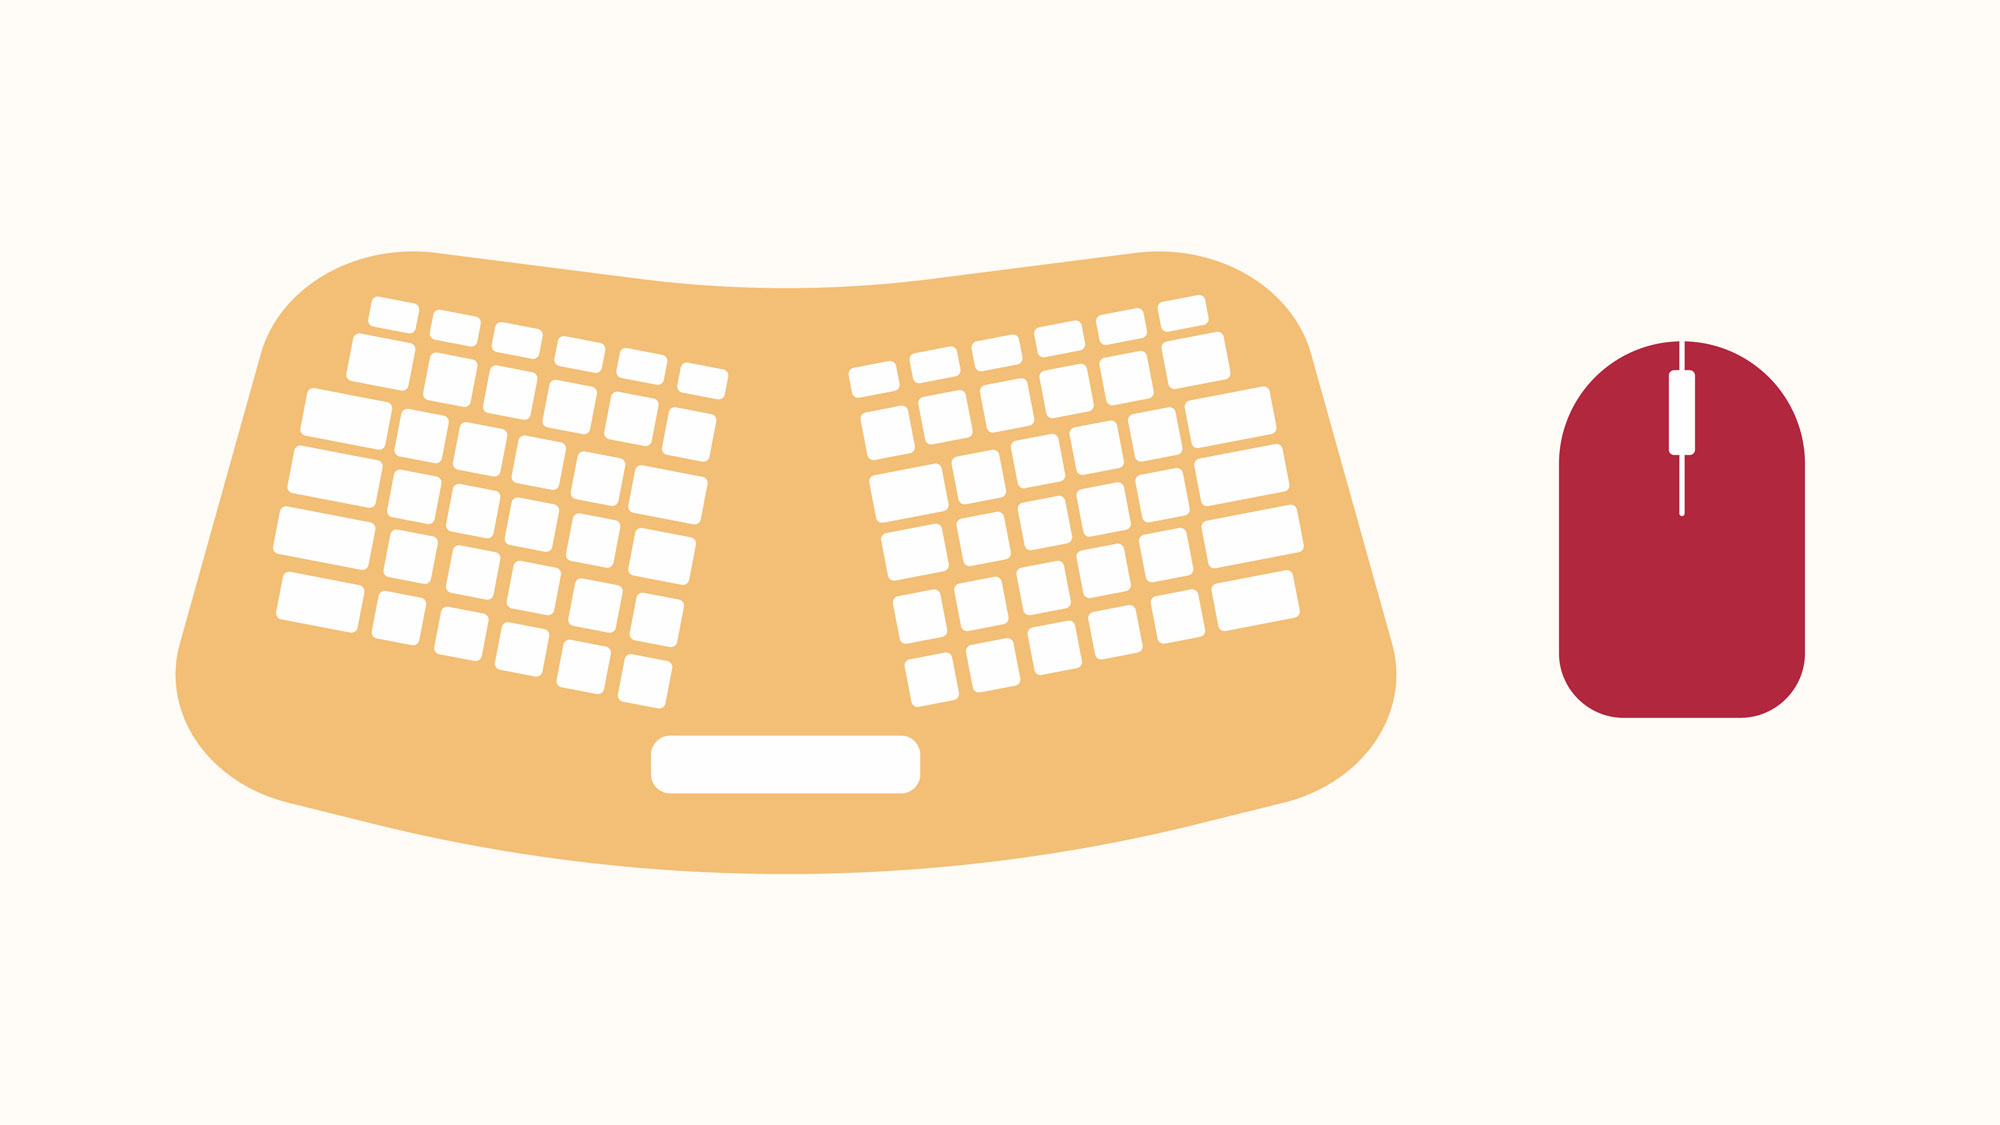 showing an ergonomic keyboard